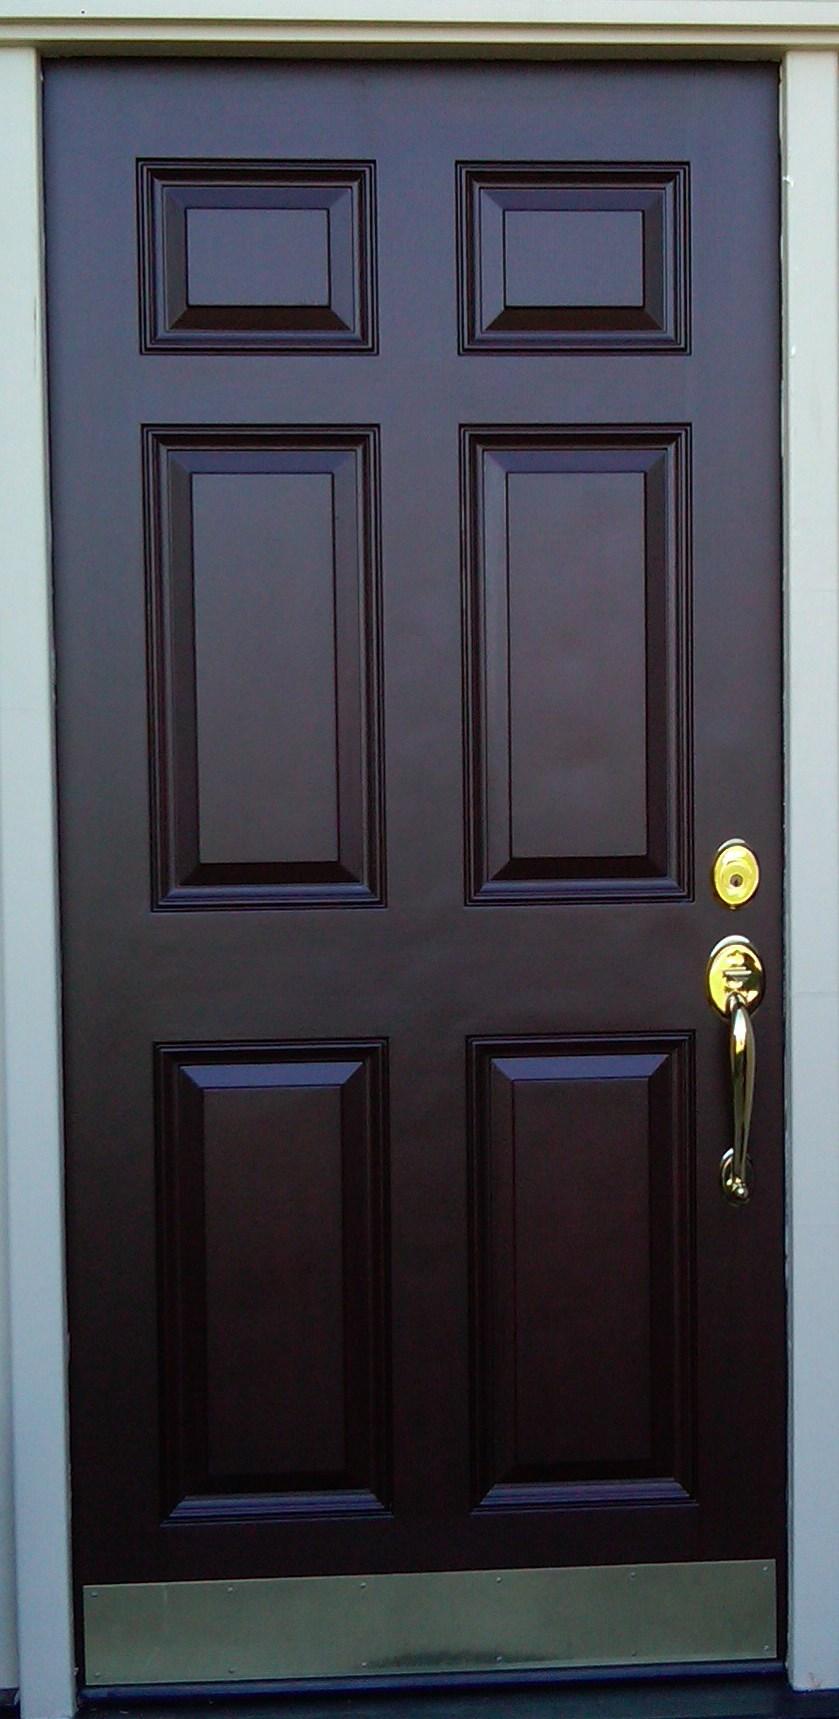 Copy of front-door-wood-wooden-restaining-old-restore-refinish